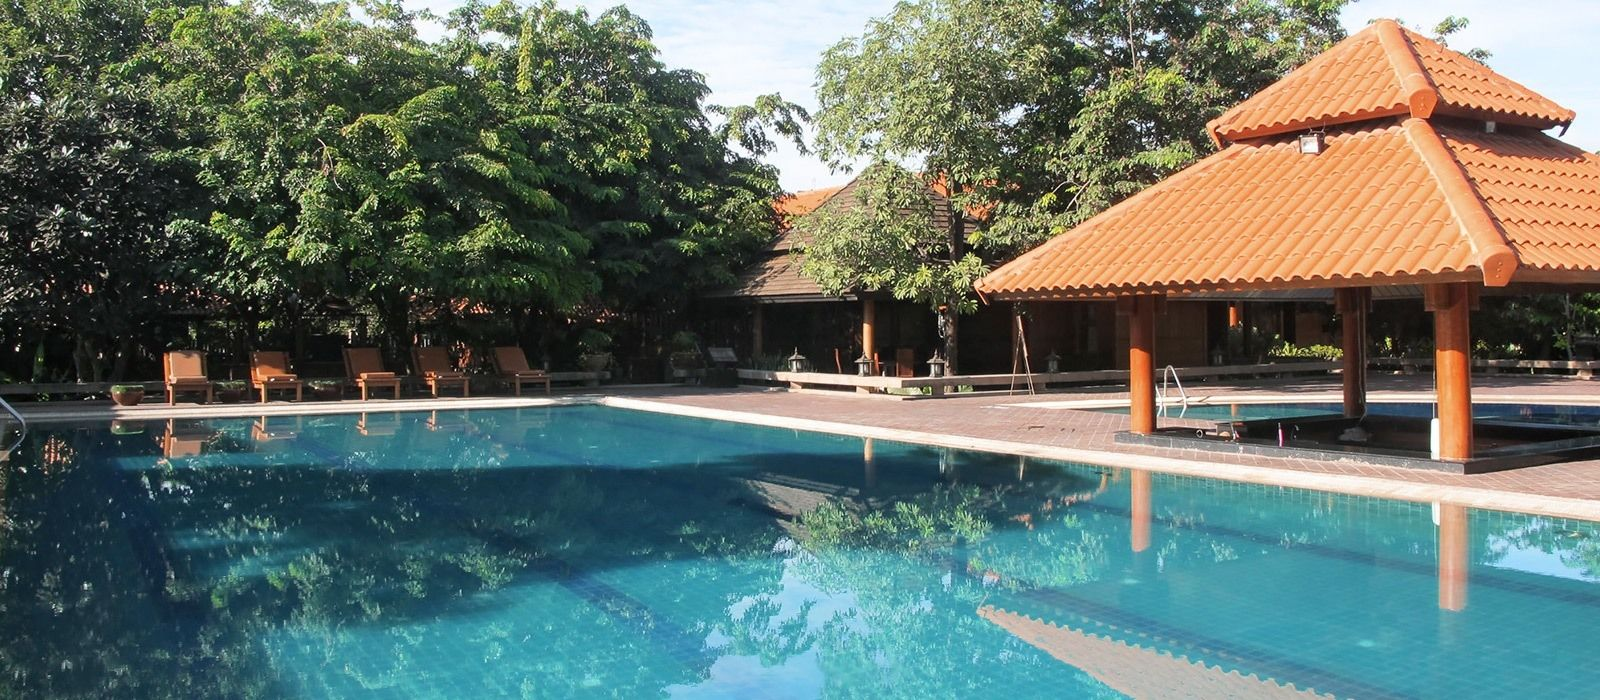 Hotel Rupar Mandalar (Mandalay) Myanmar